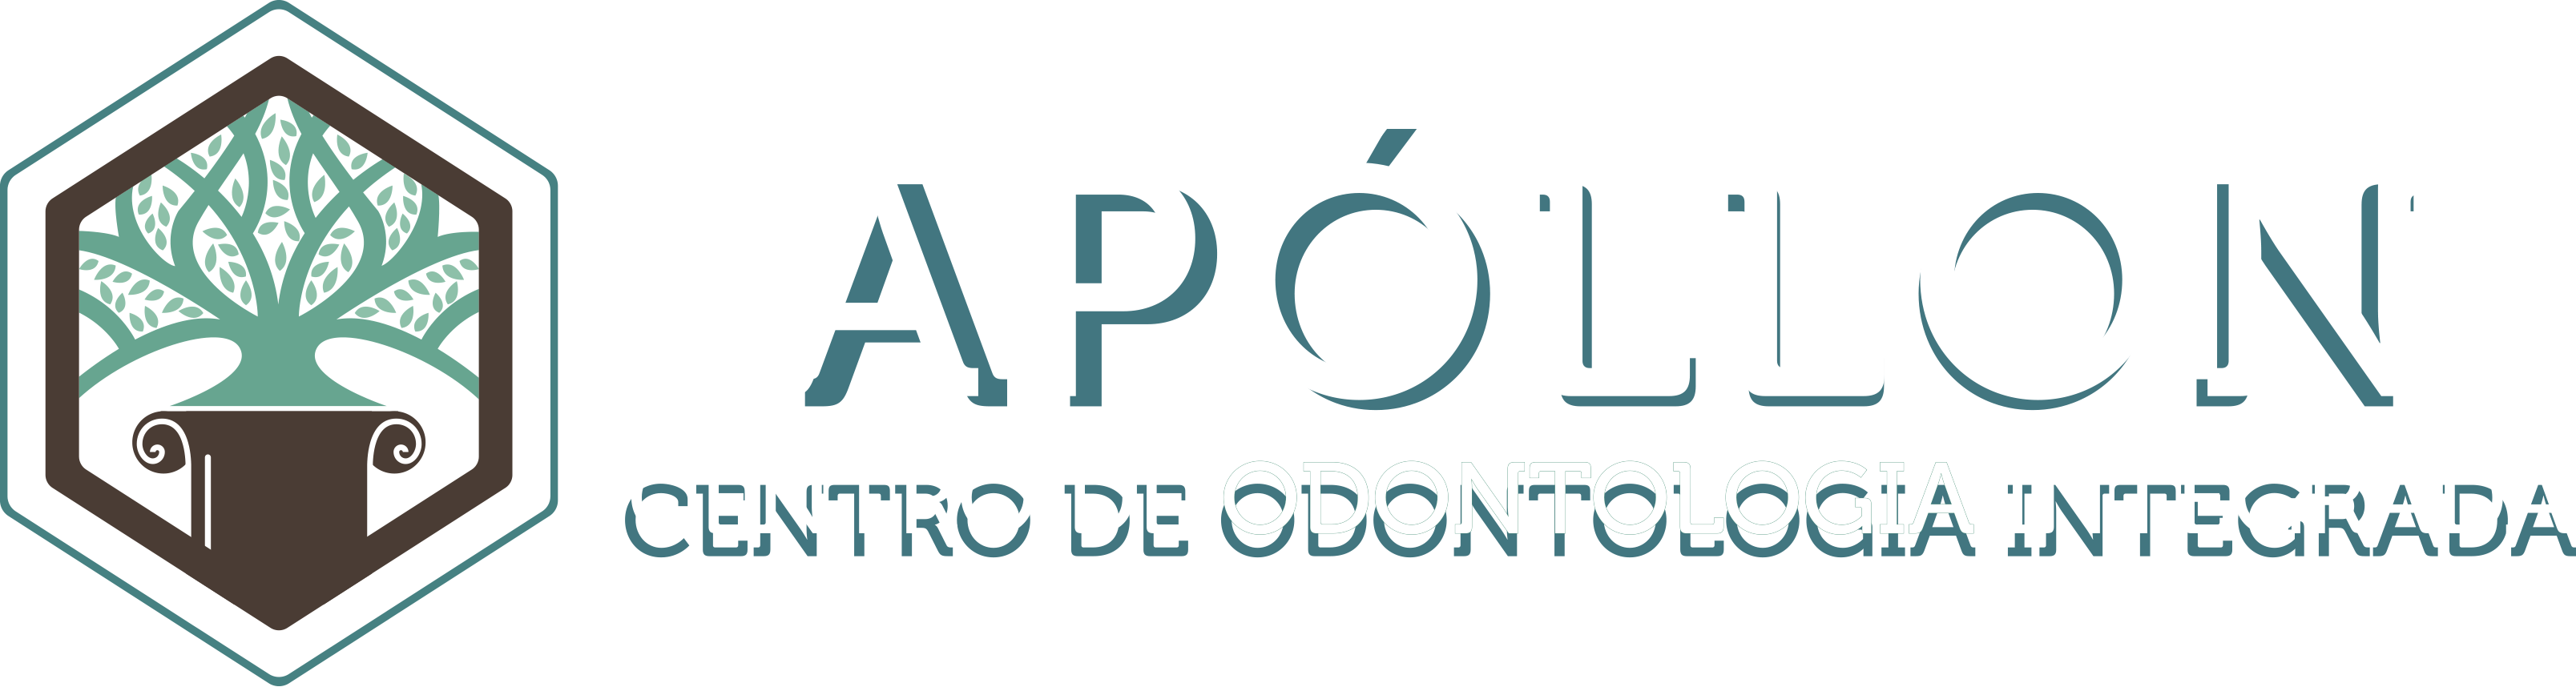 apollonodontologia.com.br